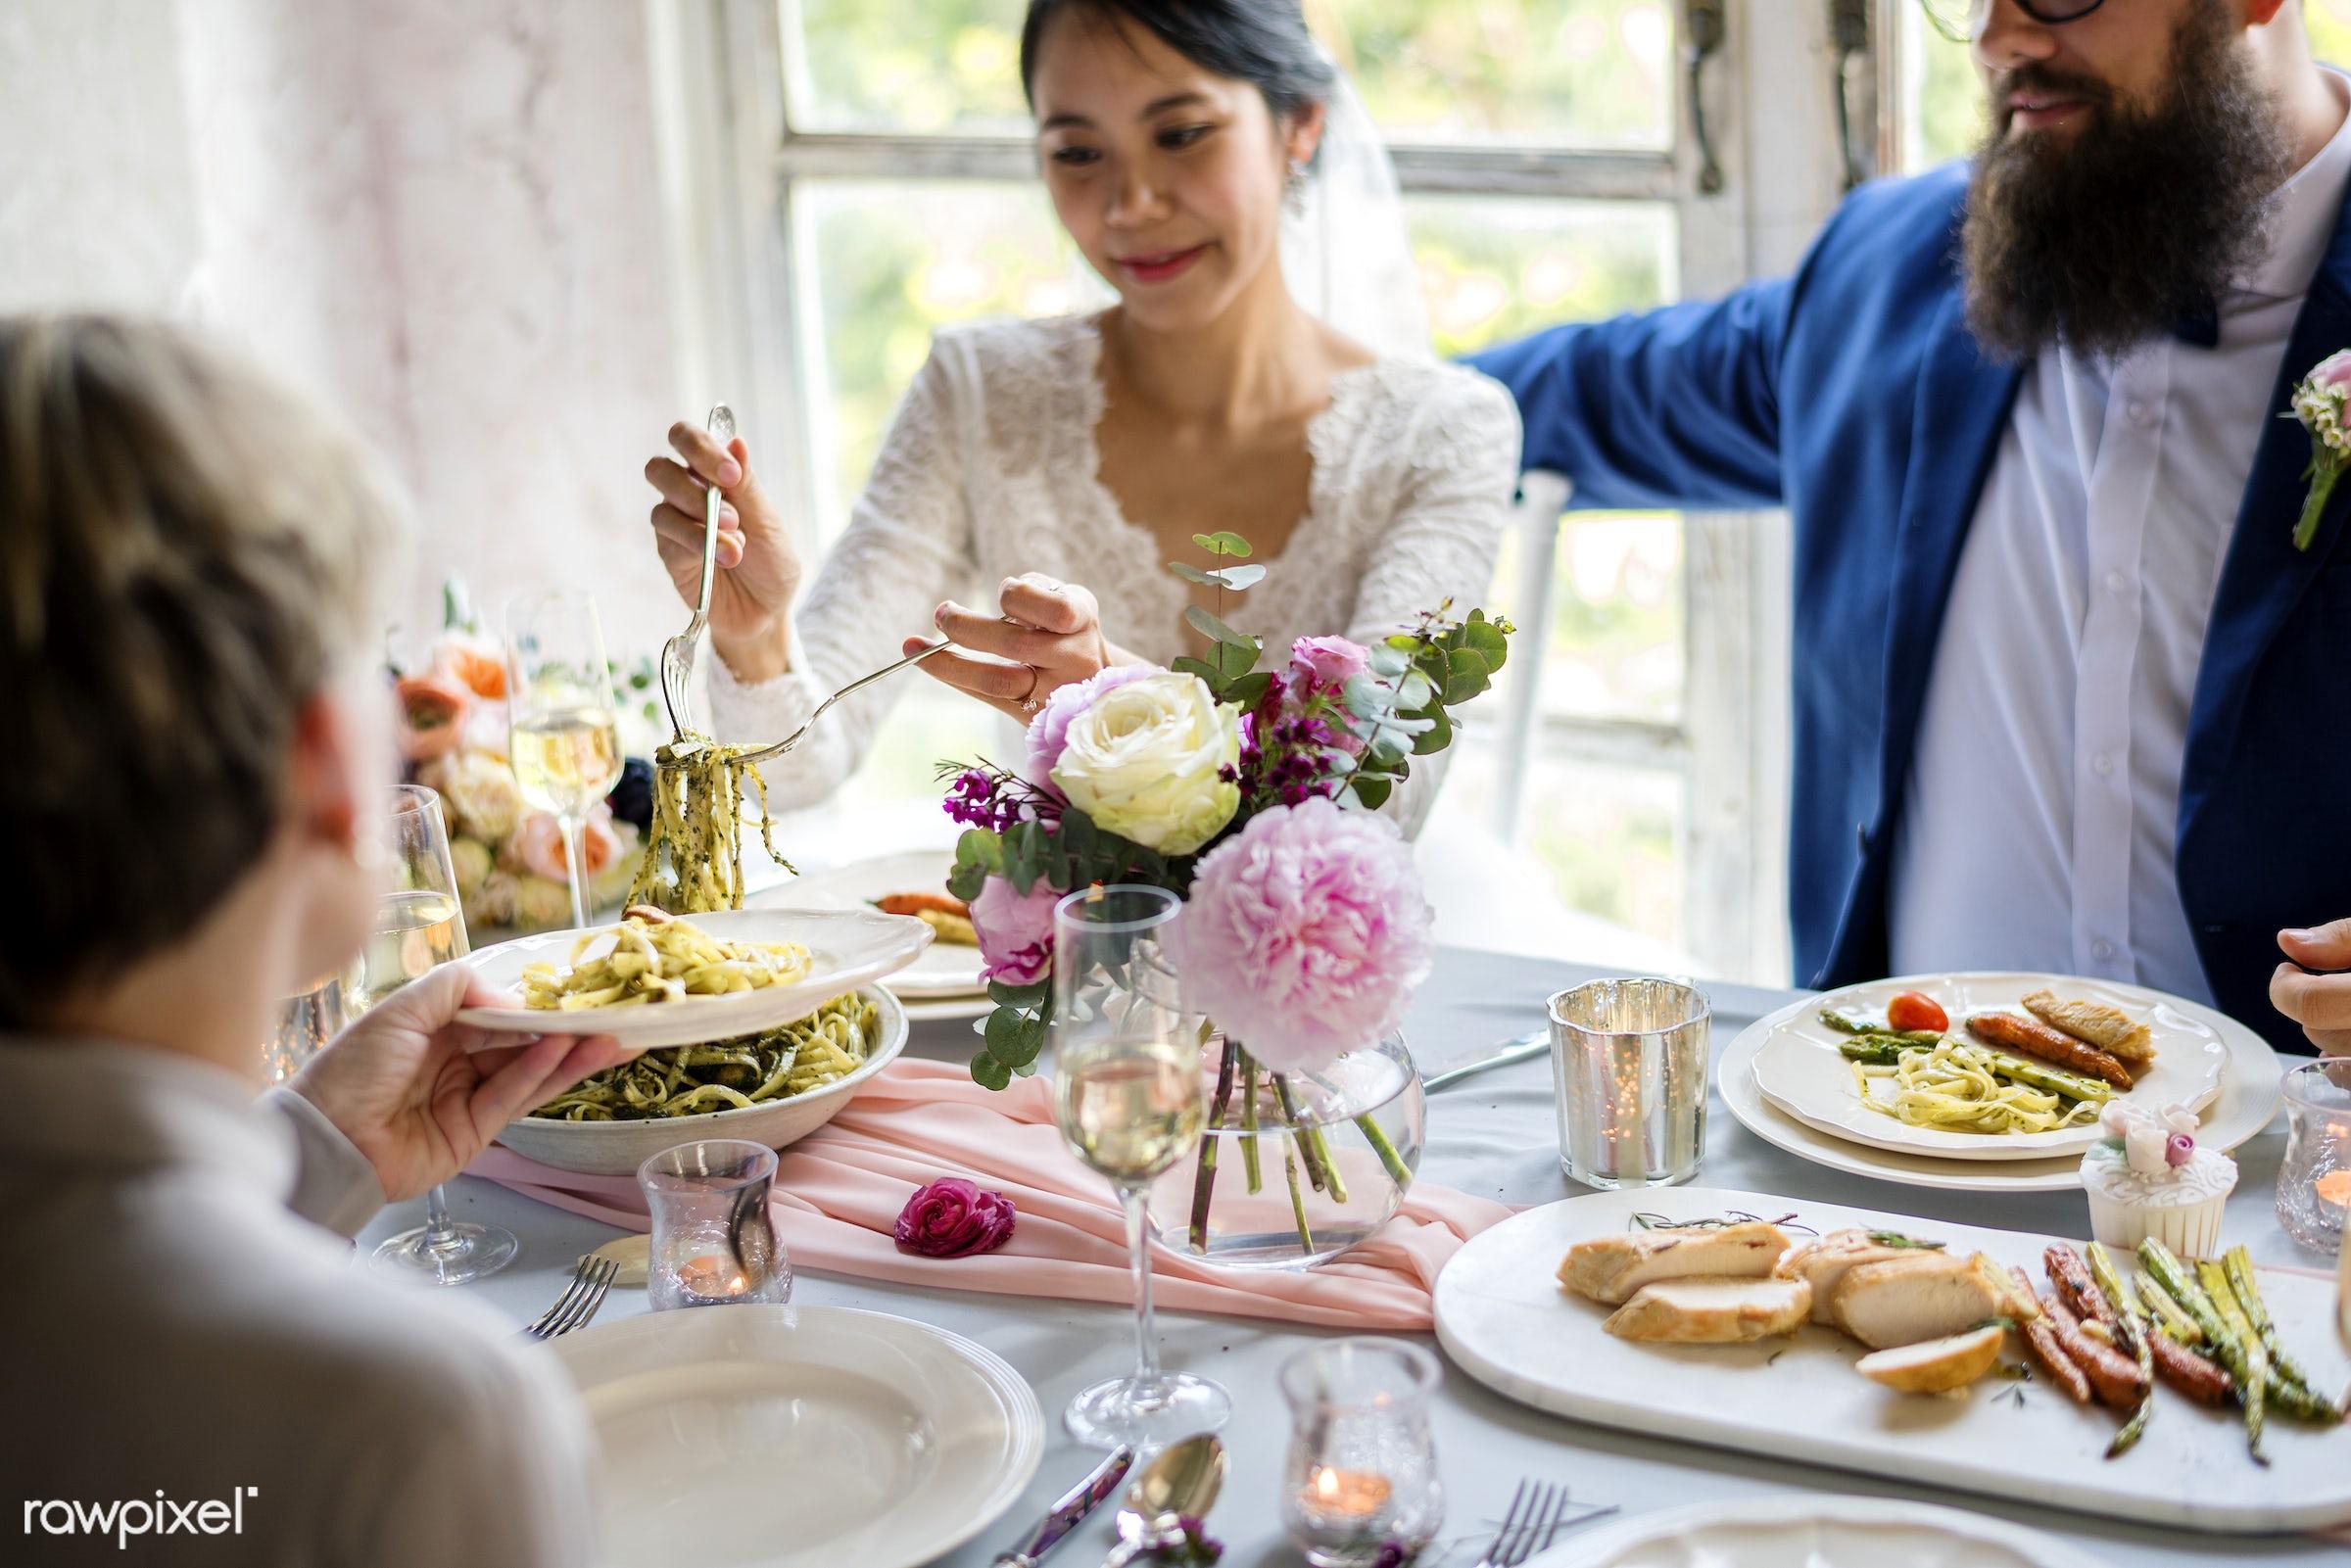 Bridge and groom wedding day - wedding, union, marriage, bride, groom, couple, spouse, even, celebration, love, romance,...